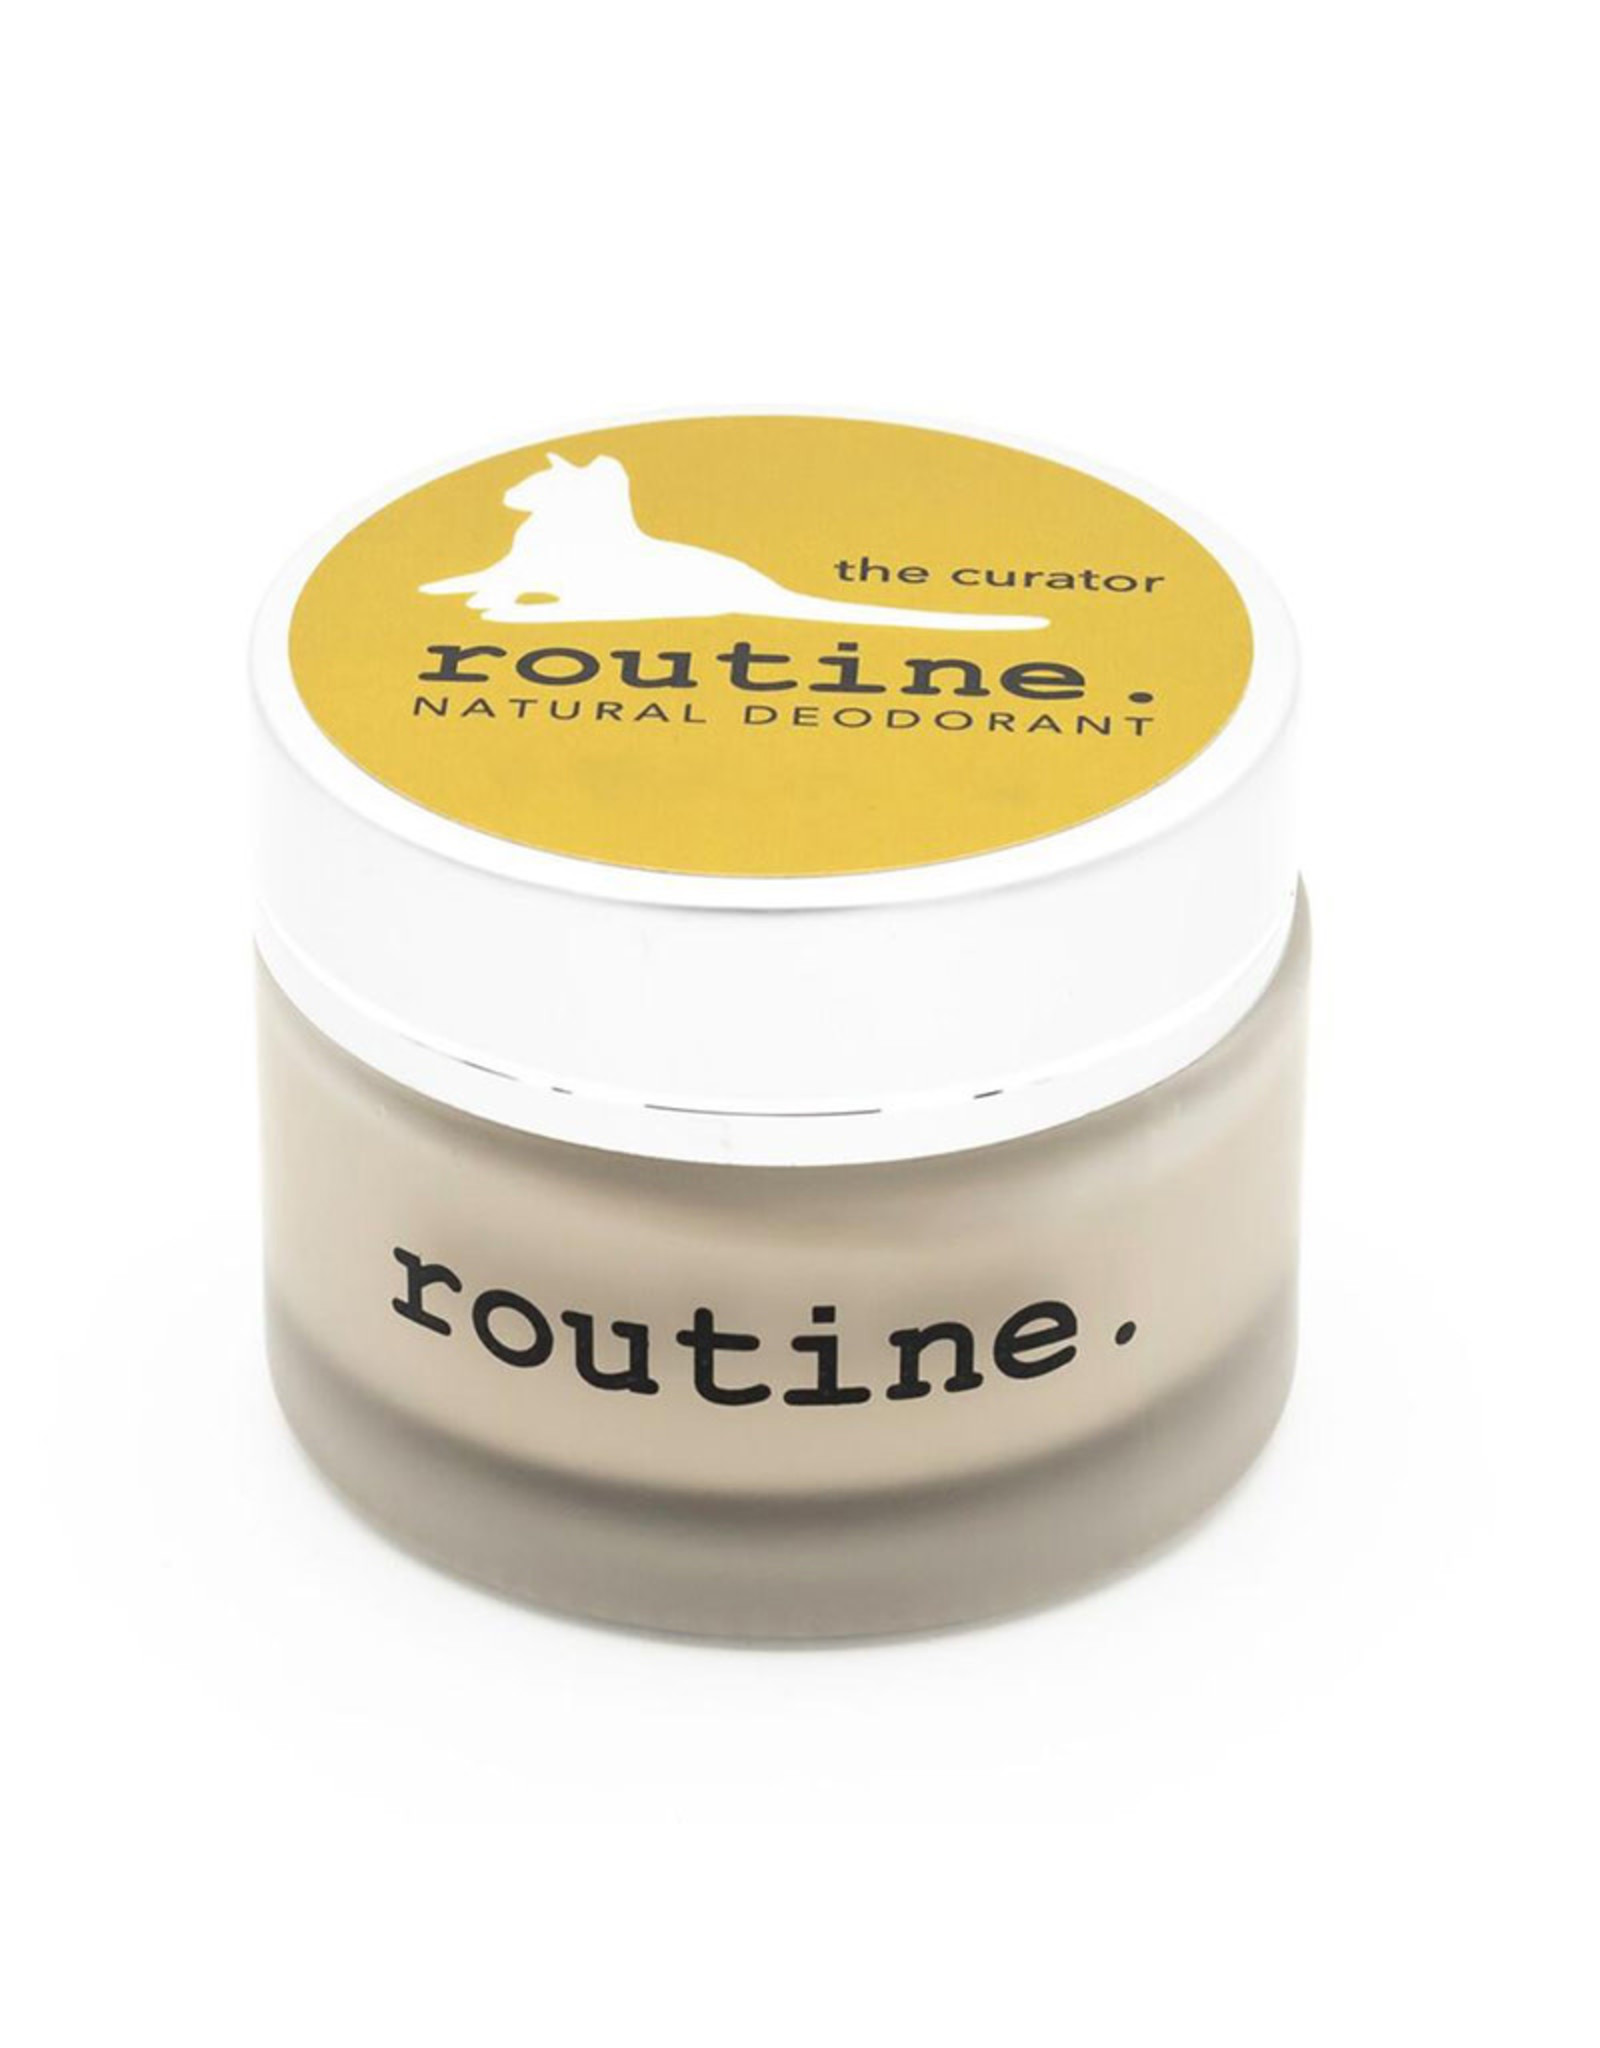 Routine Deodorant Routine - The Curator